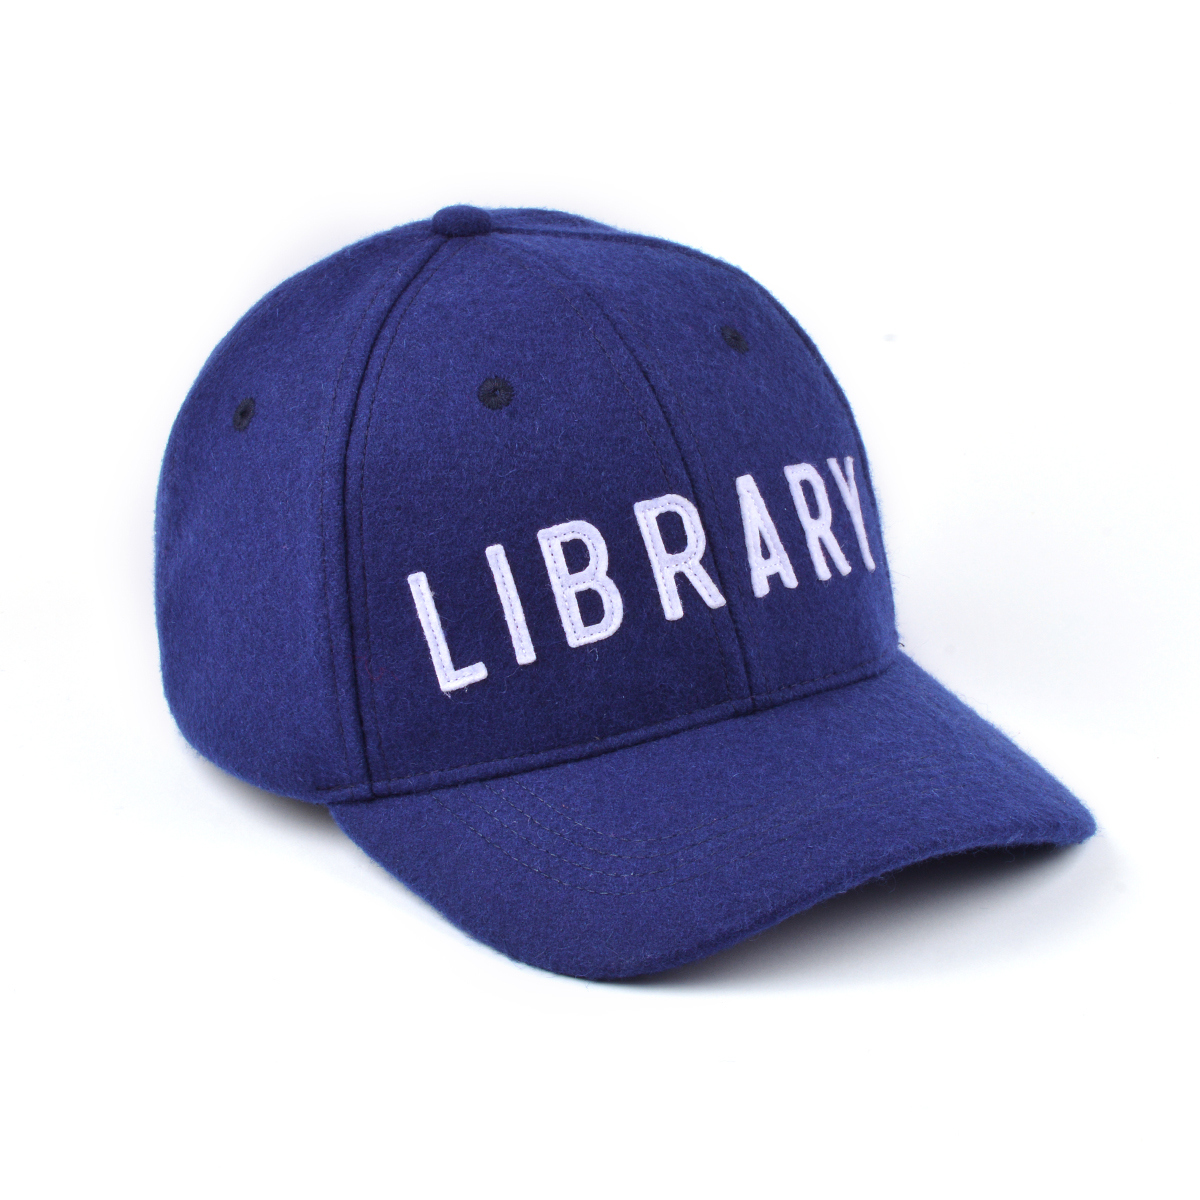 Library Hat Side 2.JPG